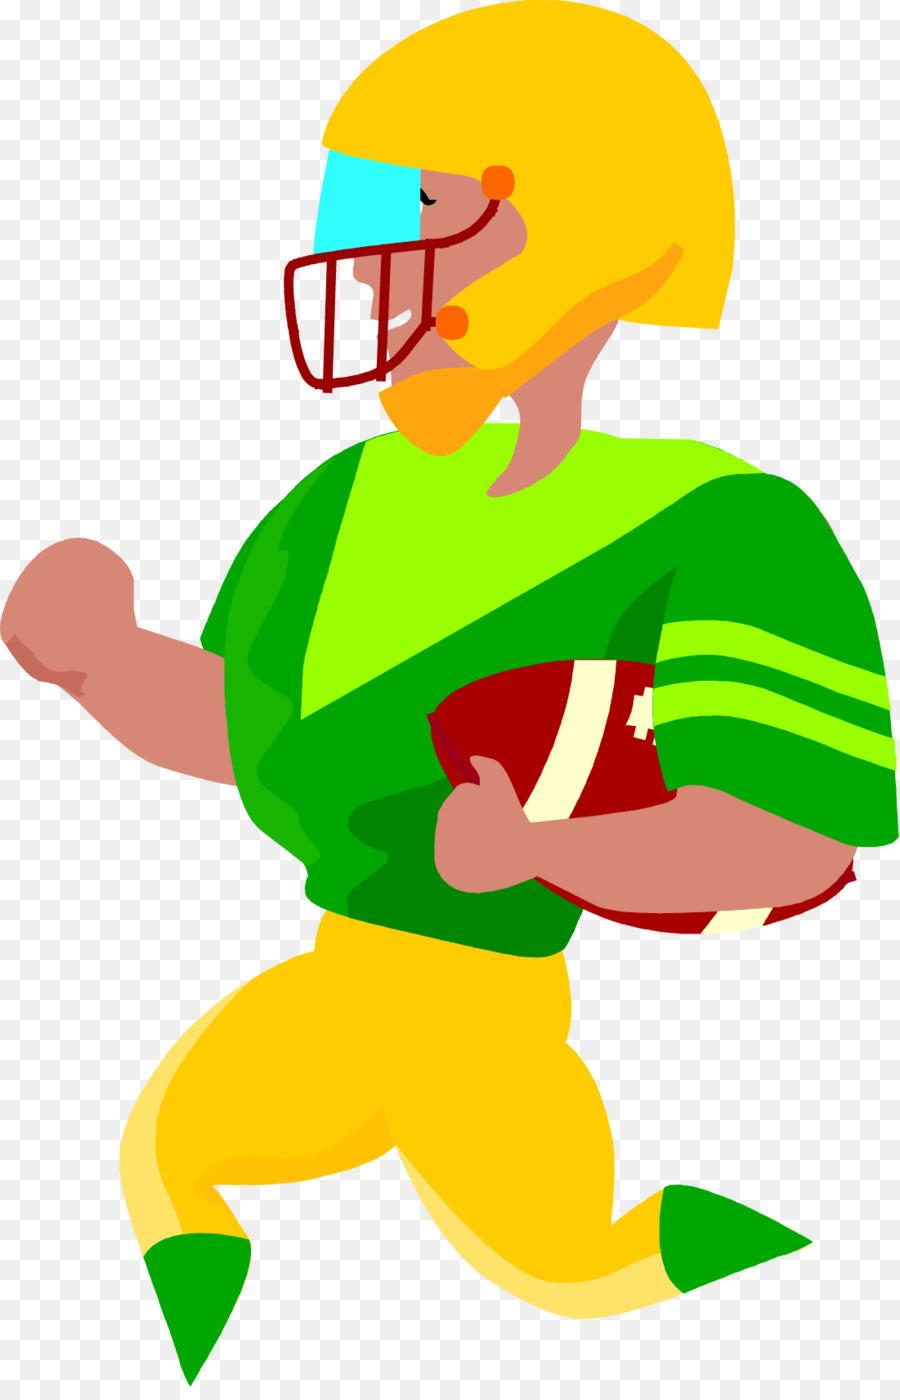 medium resolution of animated american football gifs clipart american football clip art